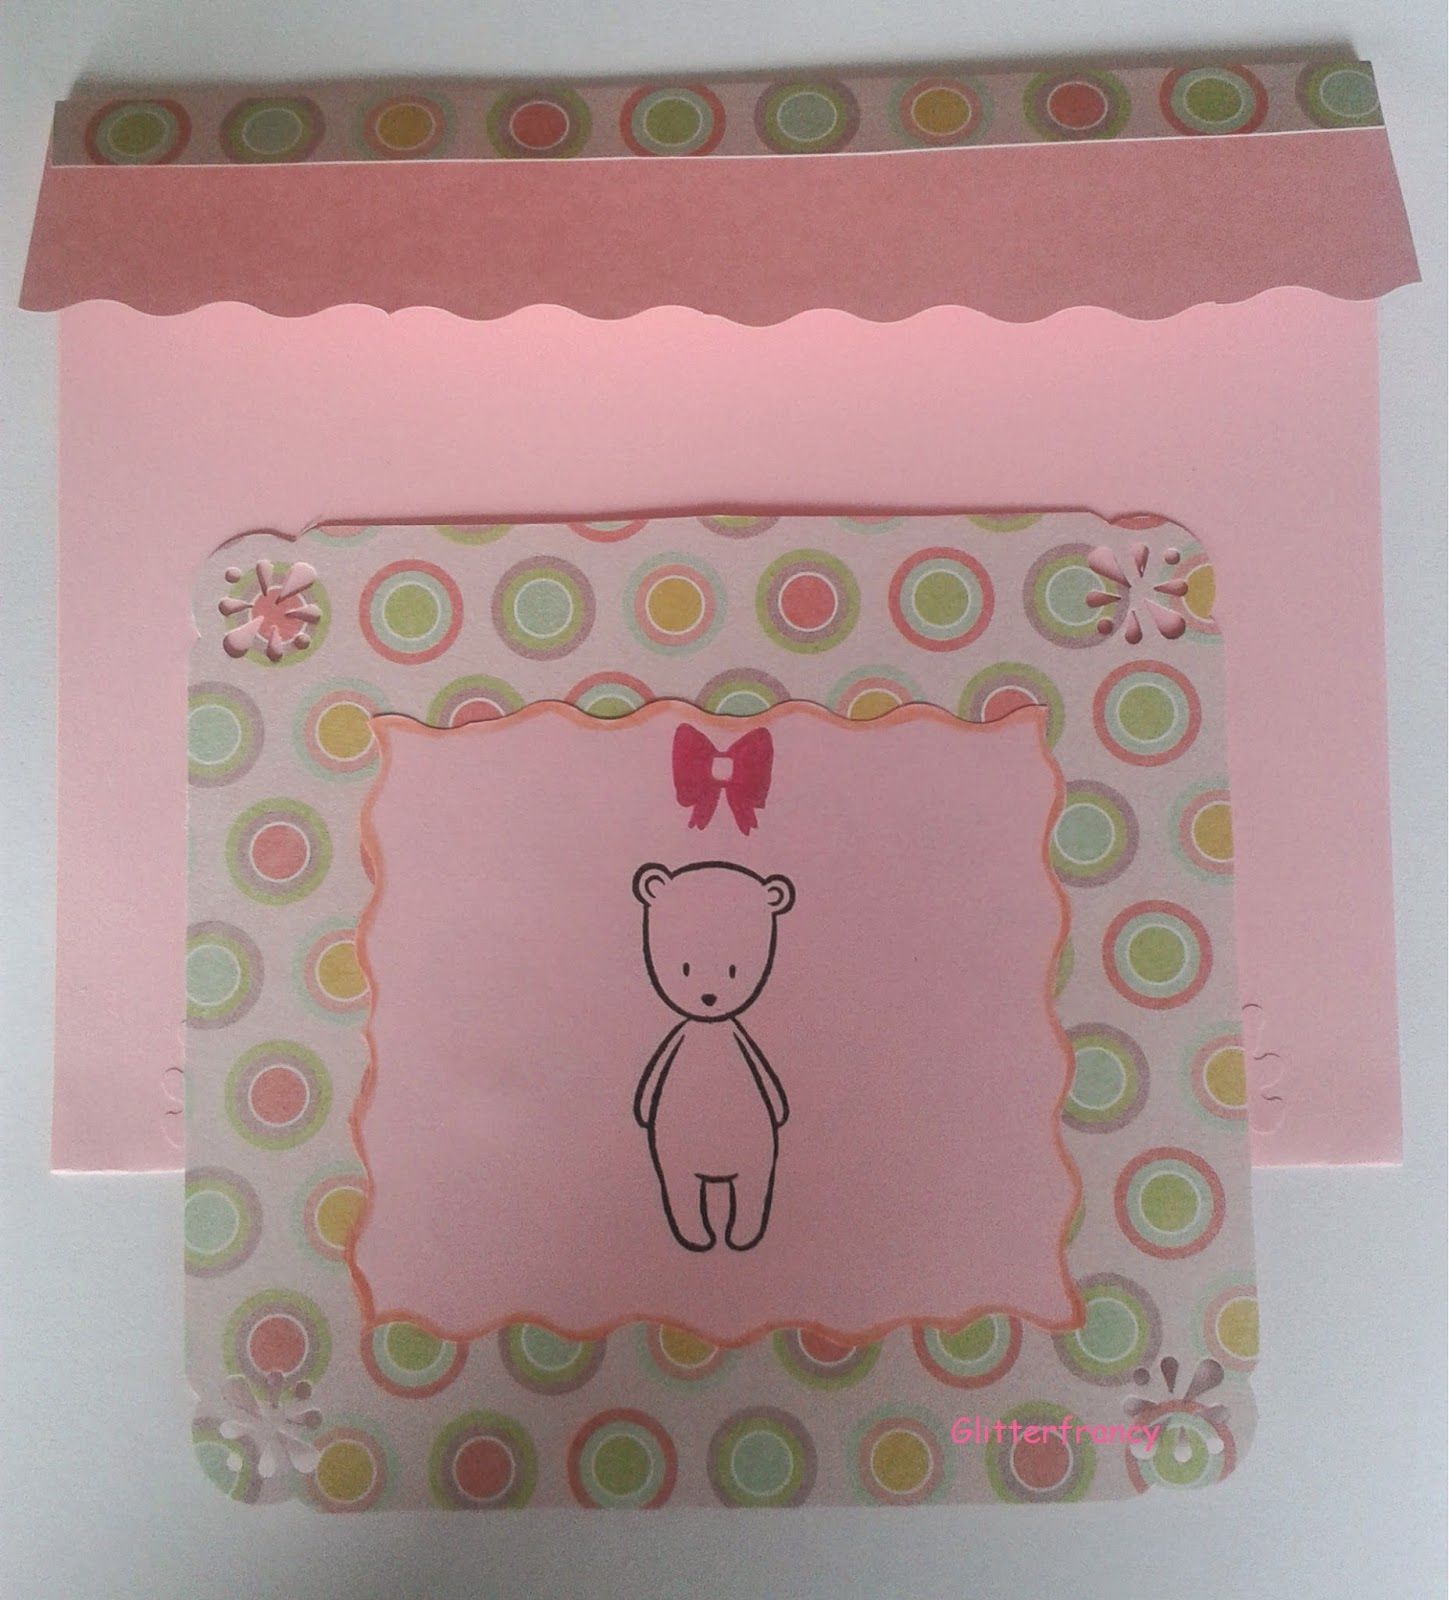 #2 Card nascita bimba con lo scrapbooking